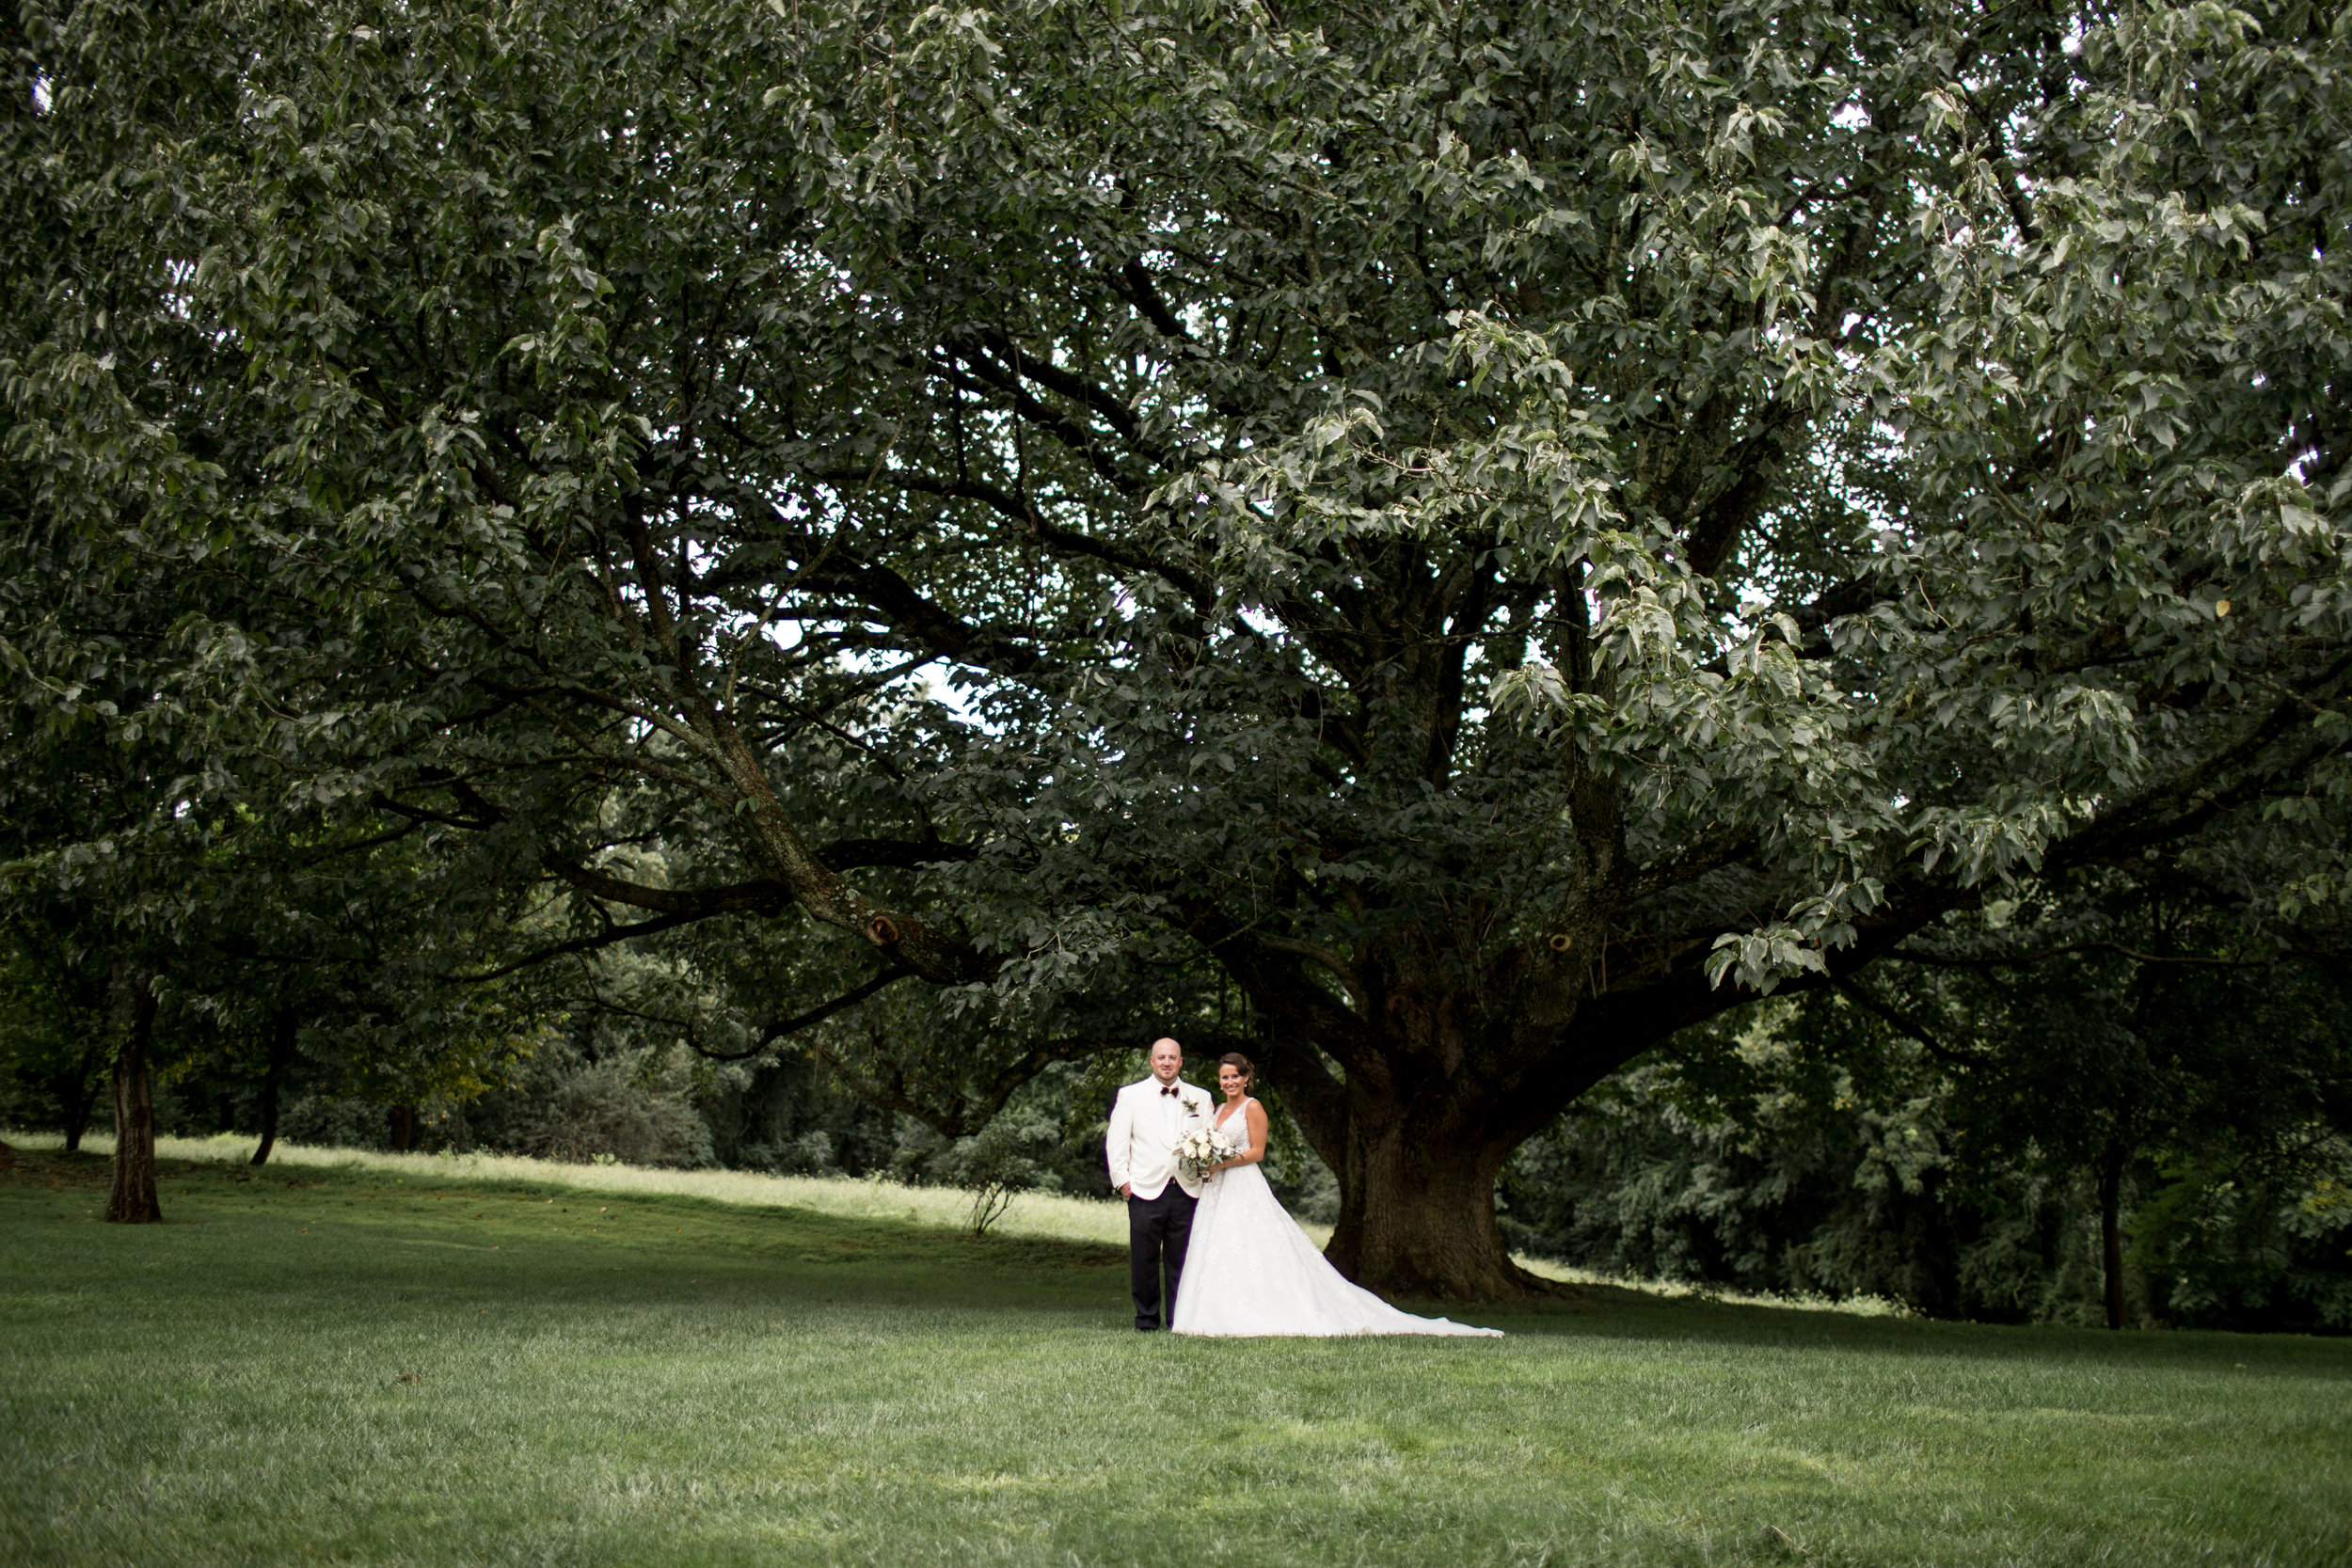 chateau-bu-de-winery-wedding-chesapeake-city-md-98.jpg